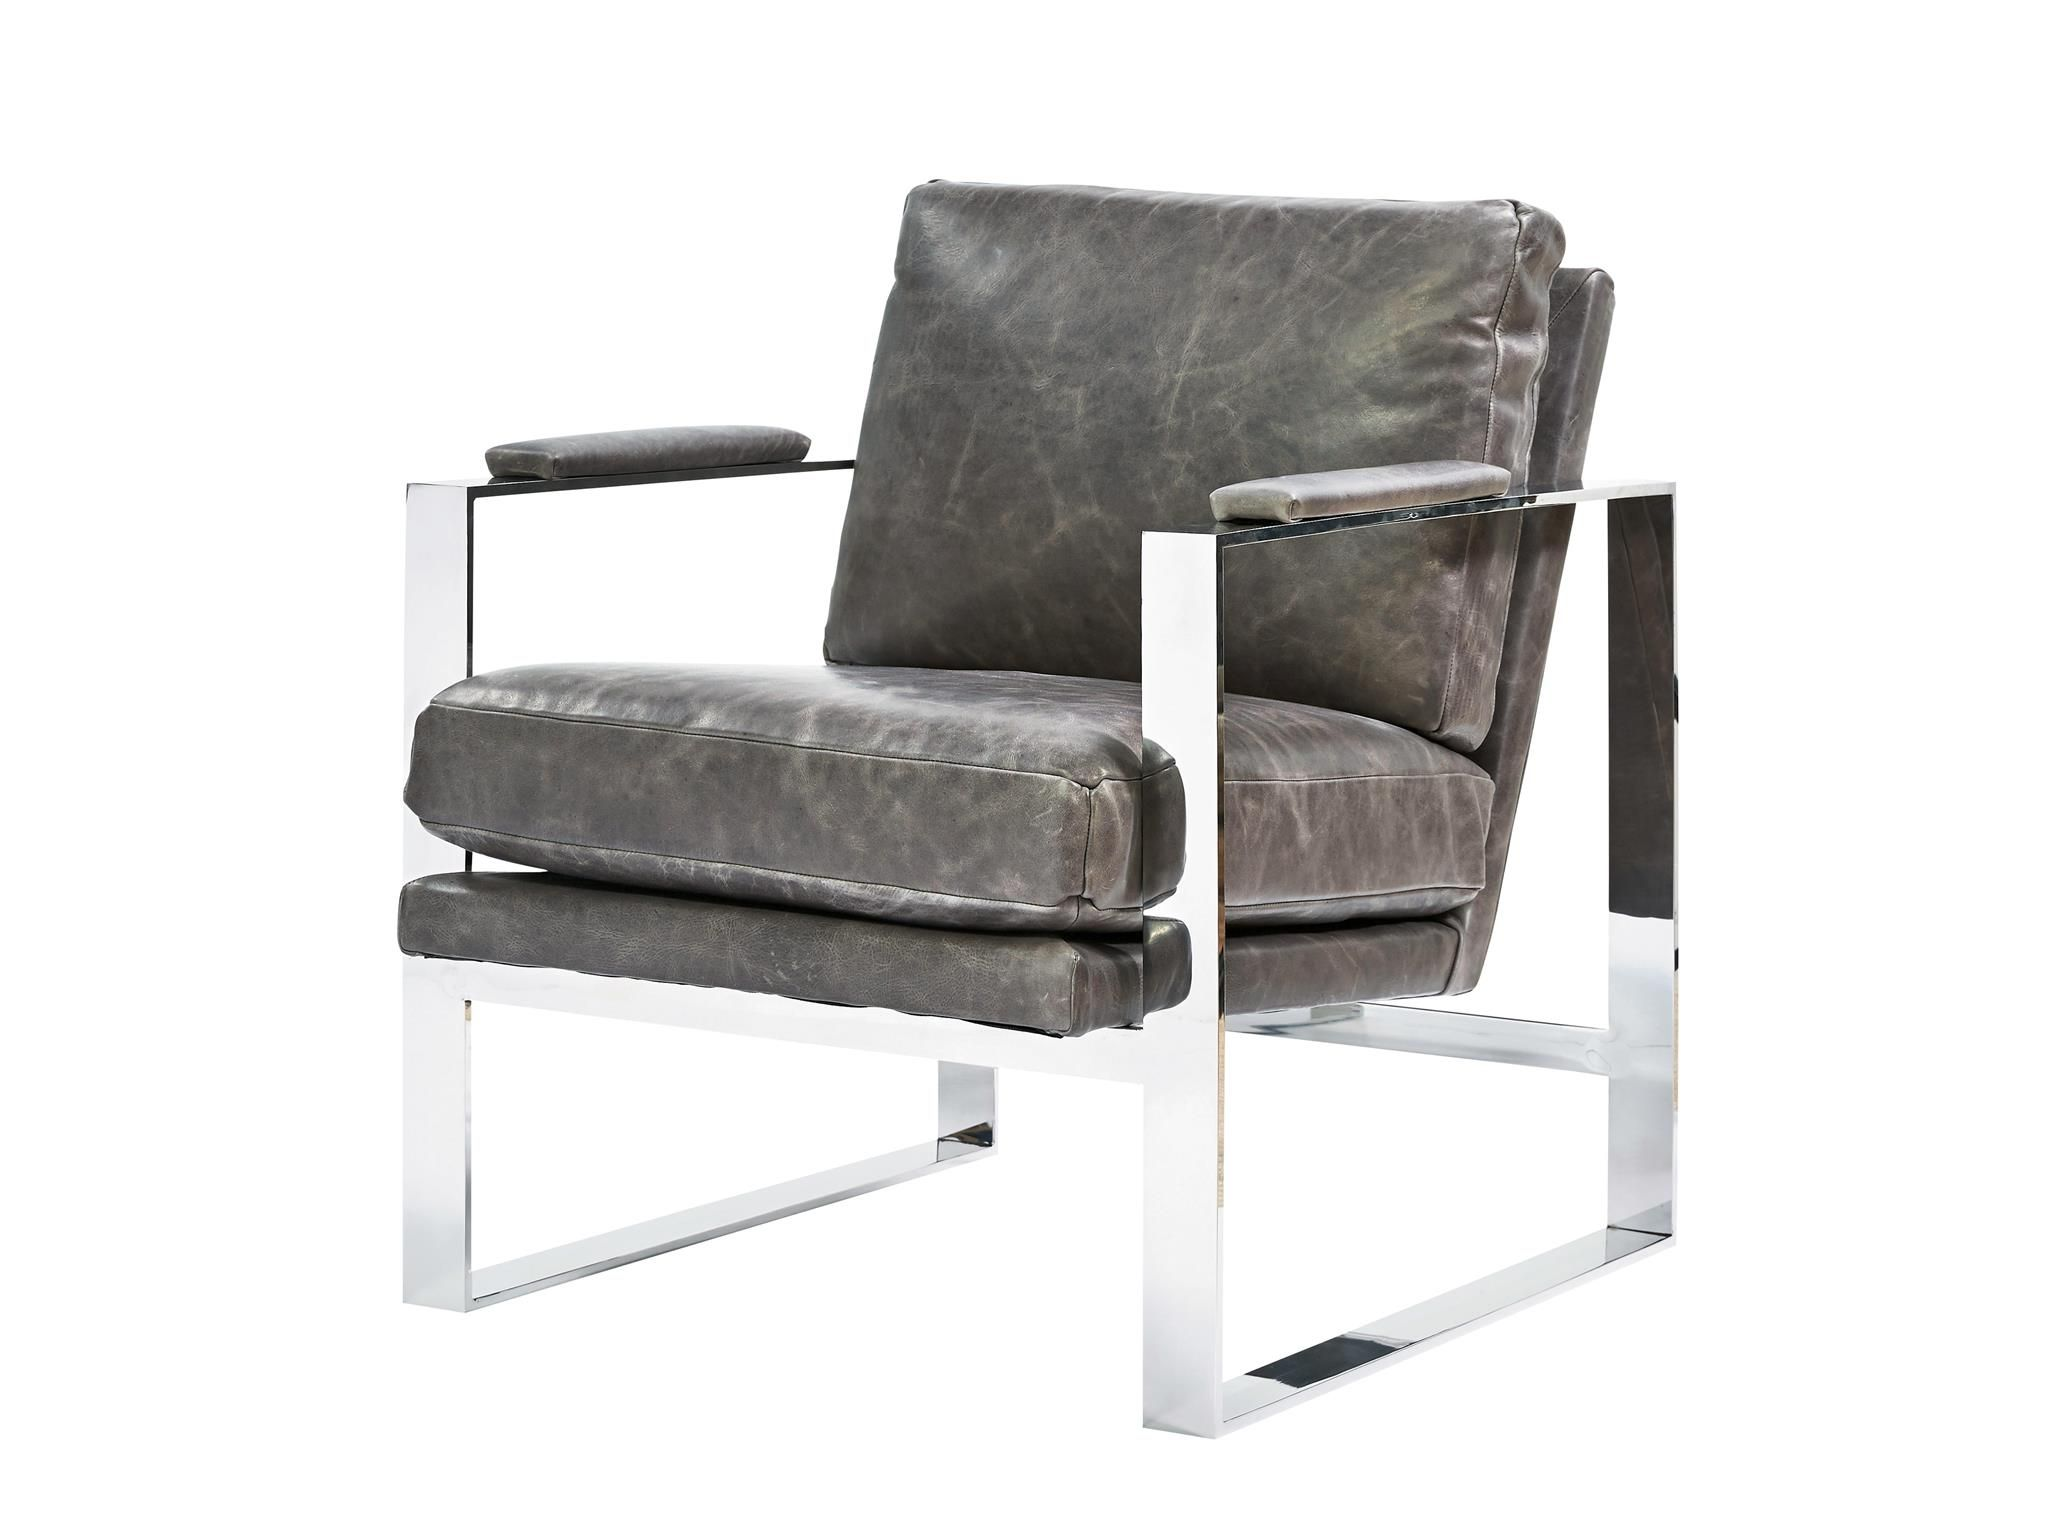 Elan Corbin Accent Chair Universal Furniture Metal